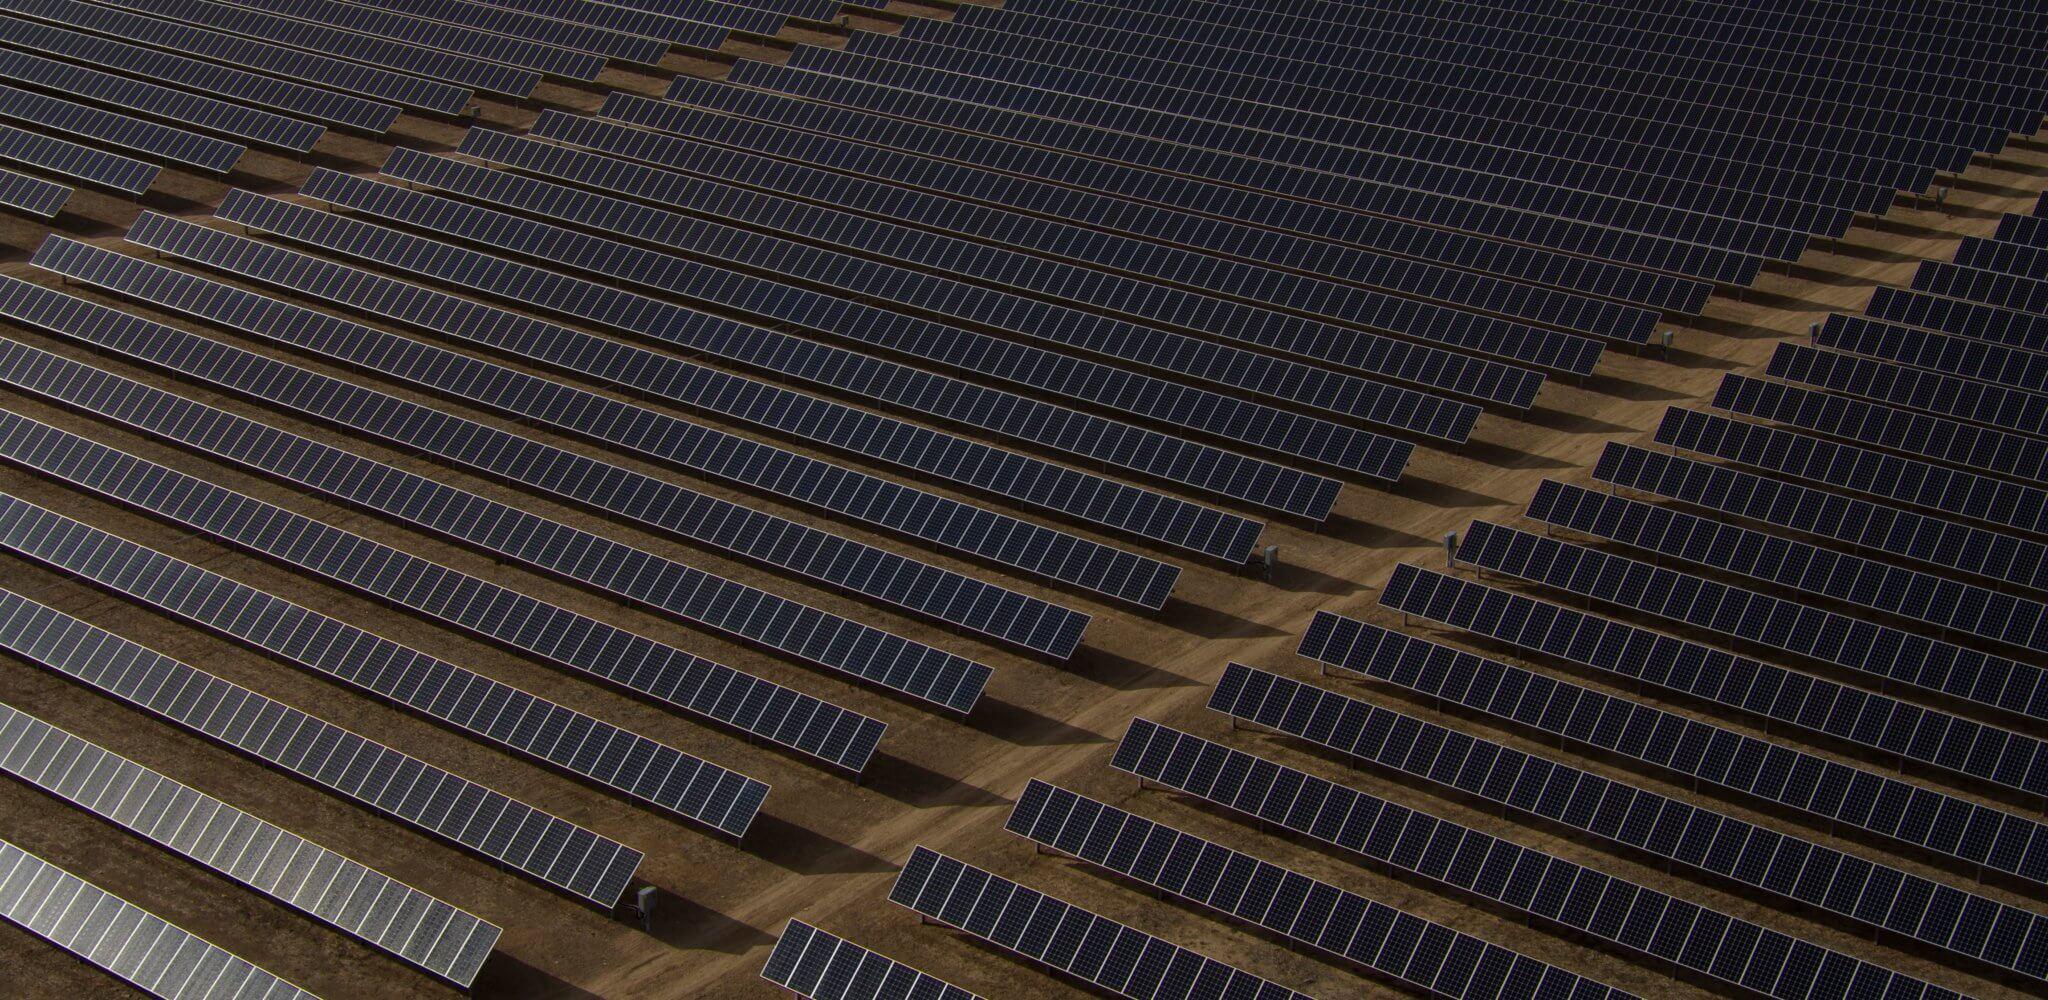 Neat rows of solar panels in Loveland, California.